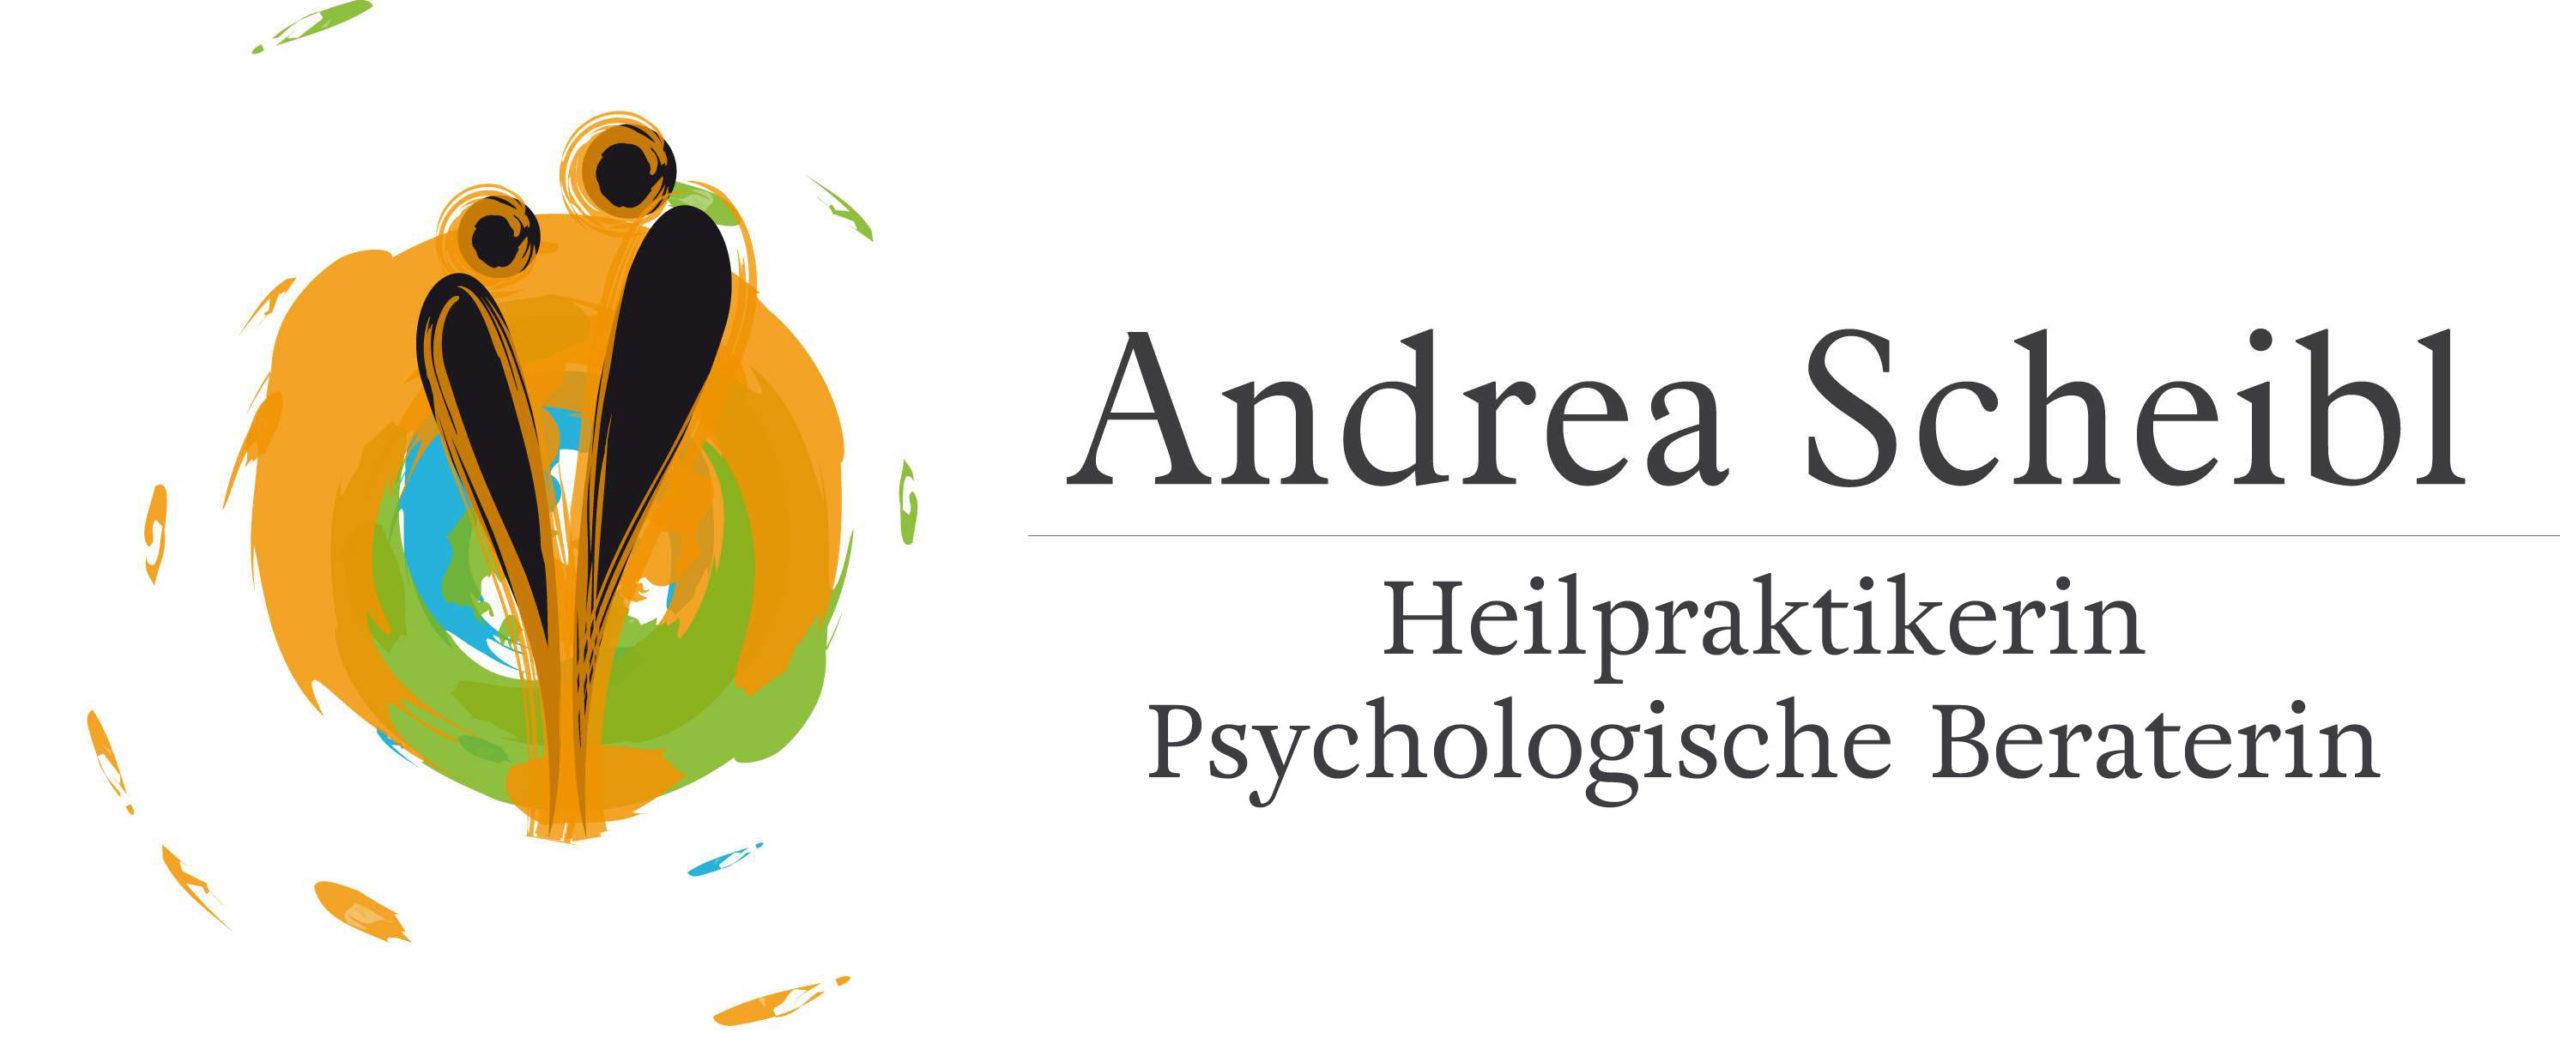 Andrea Scheibl - Heilpraktikerin, Amberg